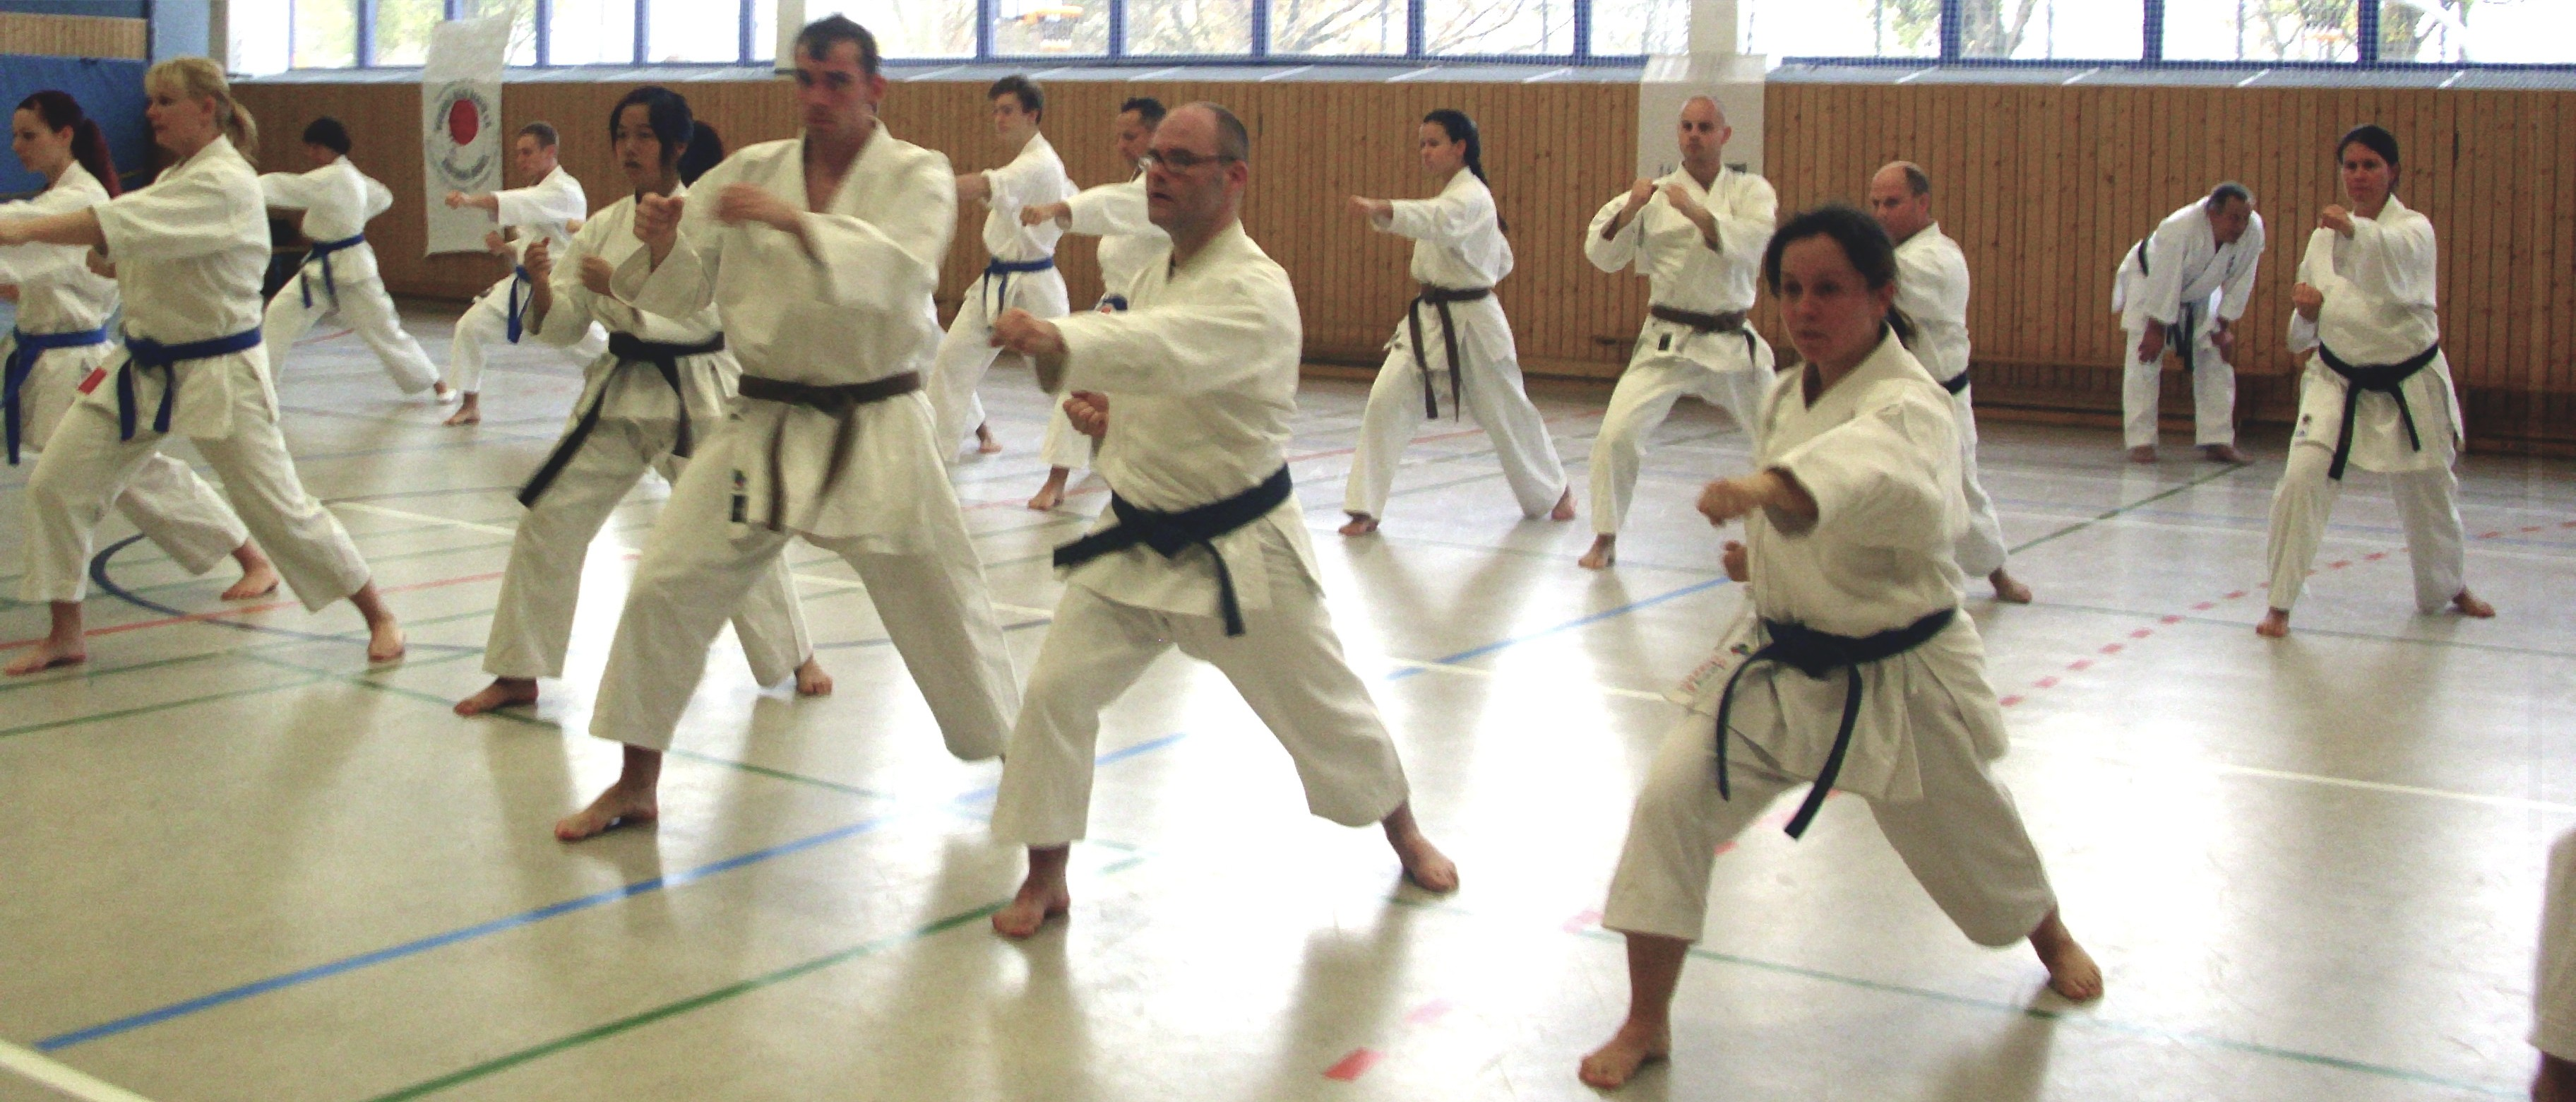 JKA-Karate Halle e.V.